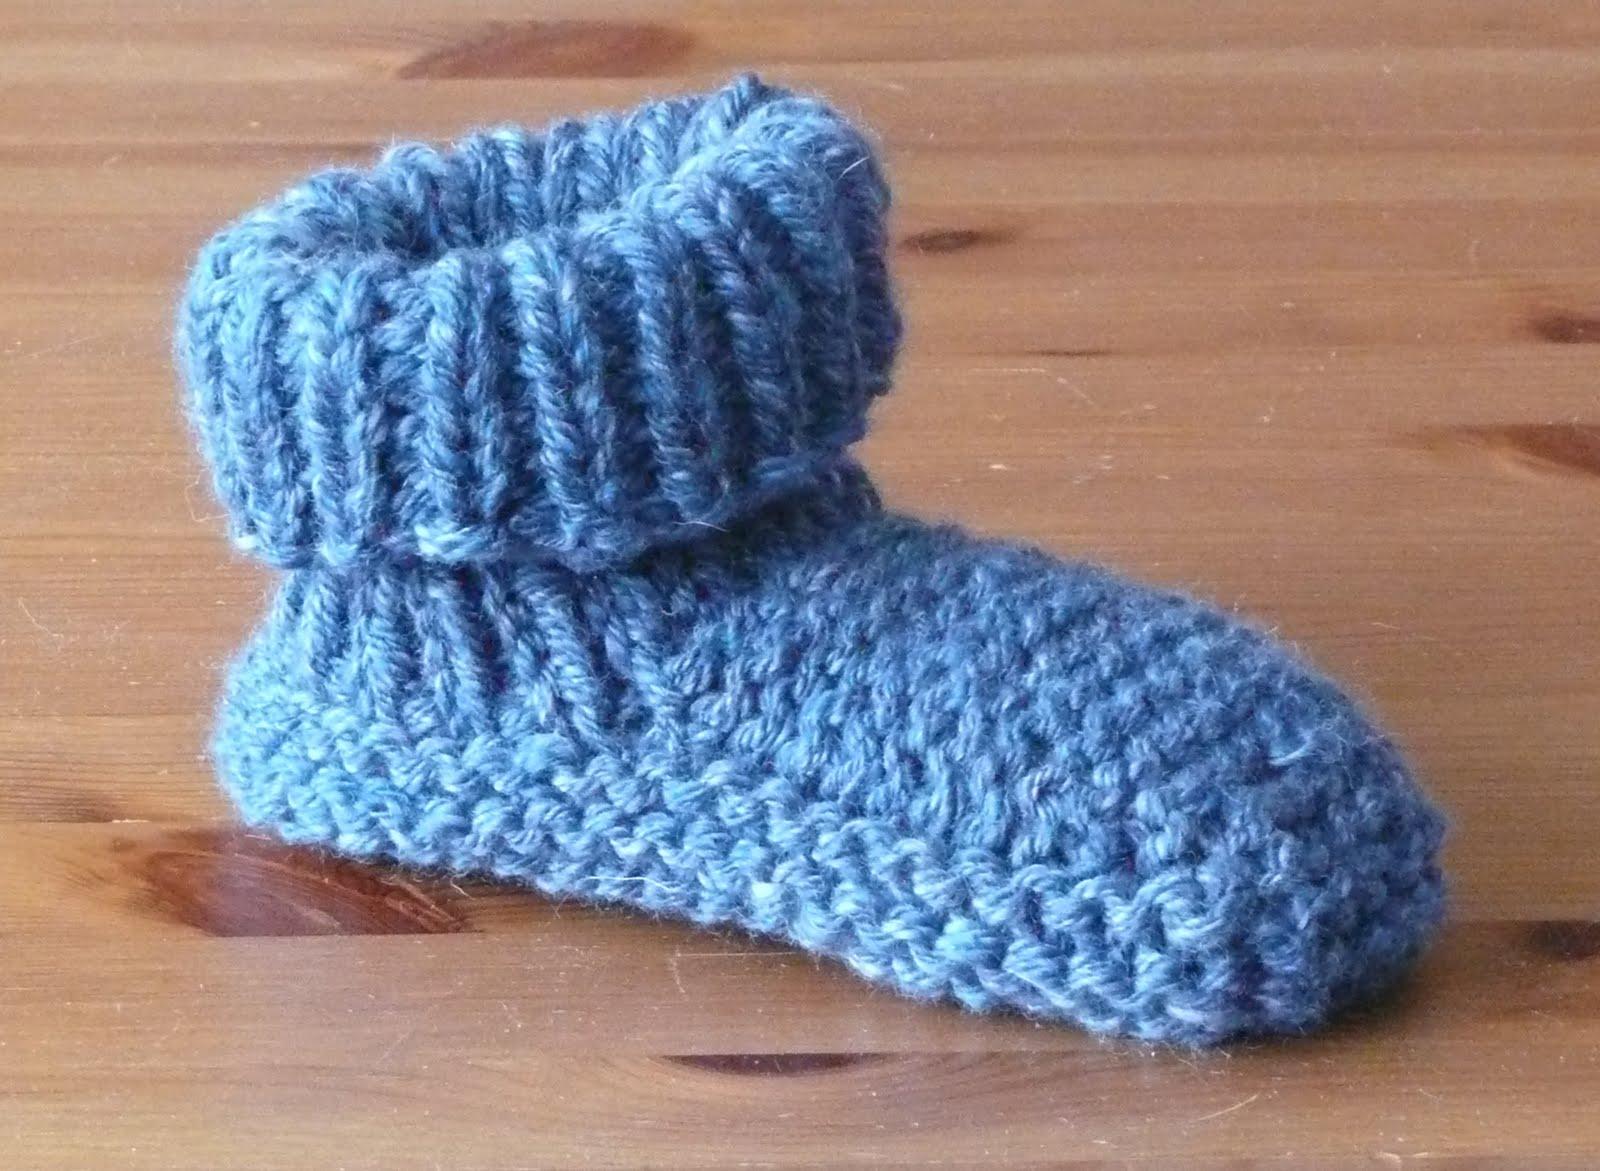 Knitting Grandma Slippers : Pogknits: march 2011